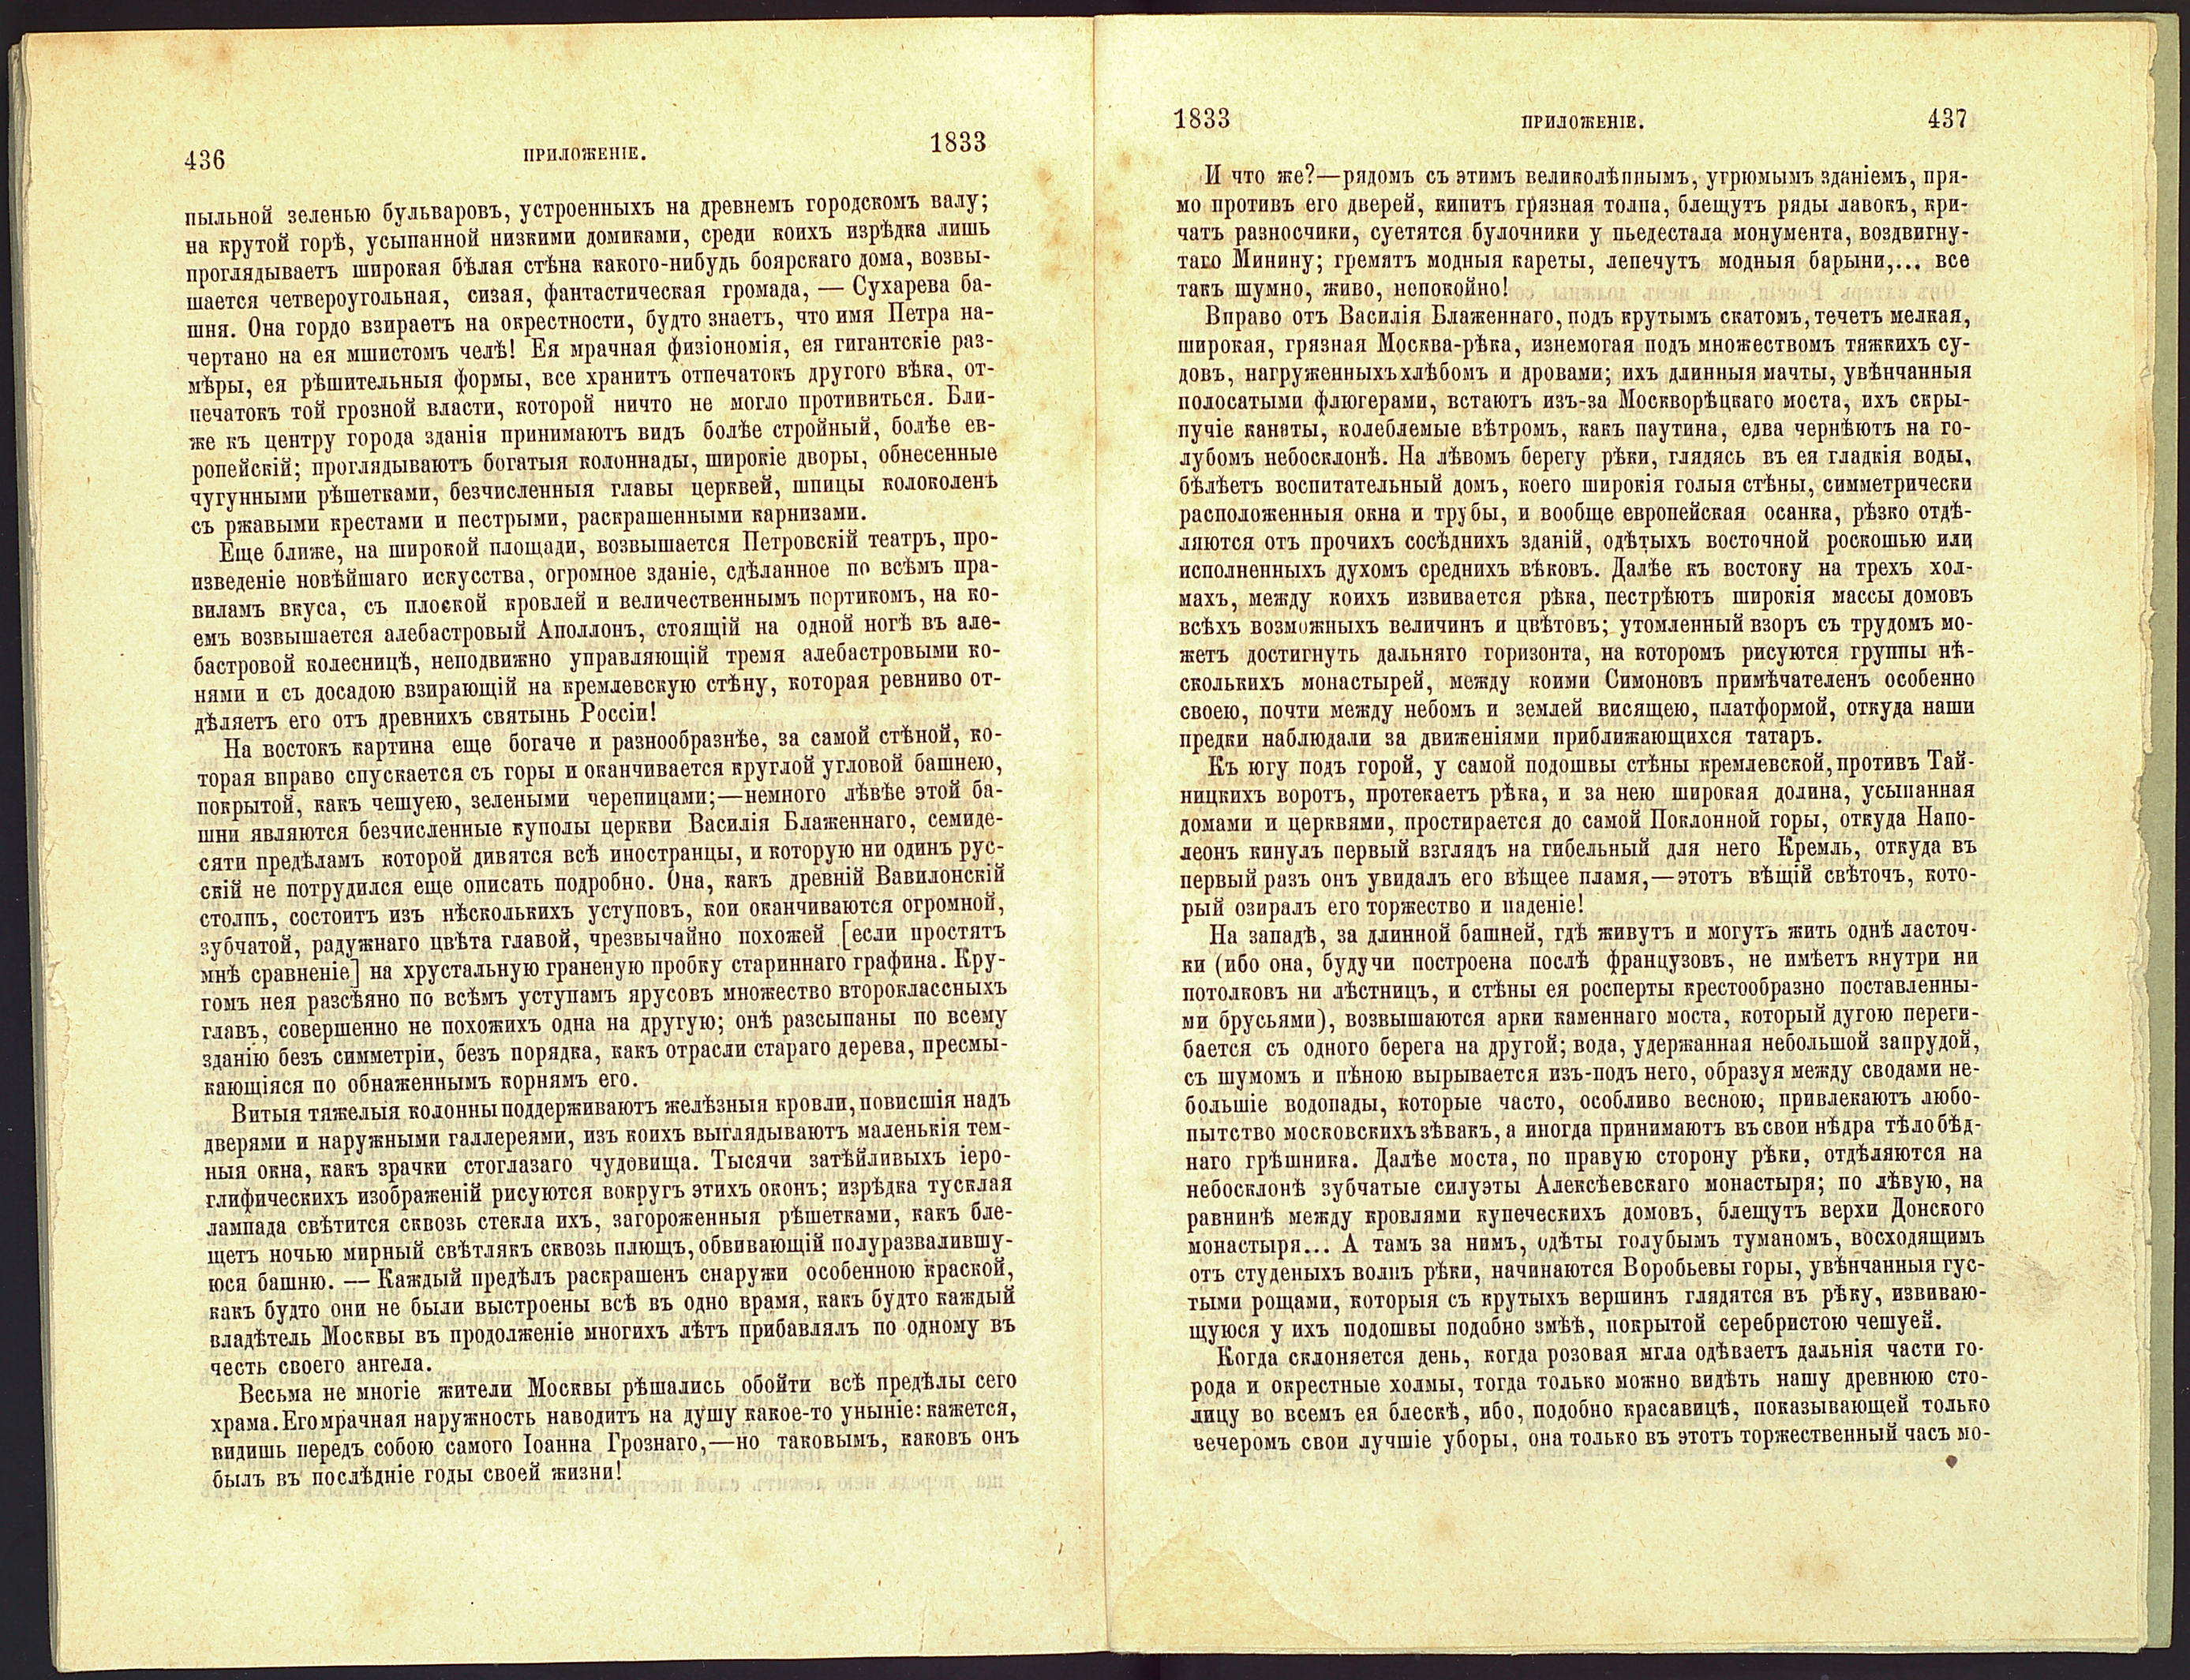 ЛОК-1819 ТАРХАНЫ КП-3642 М.Ю. Лермонтов Книга Сочинения. Т. 5._5